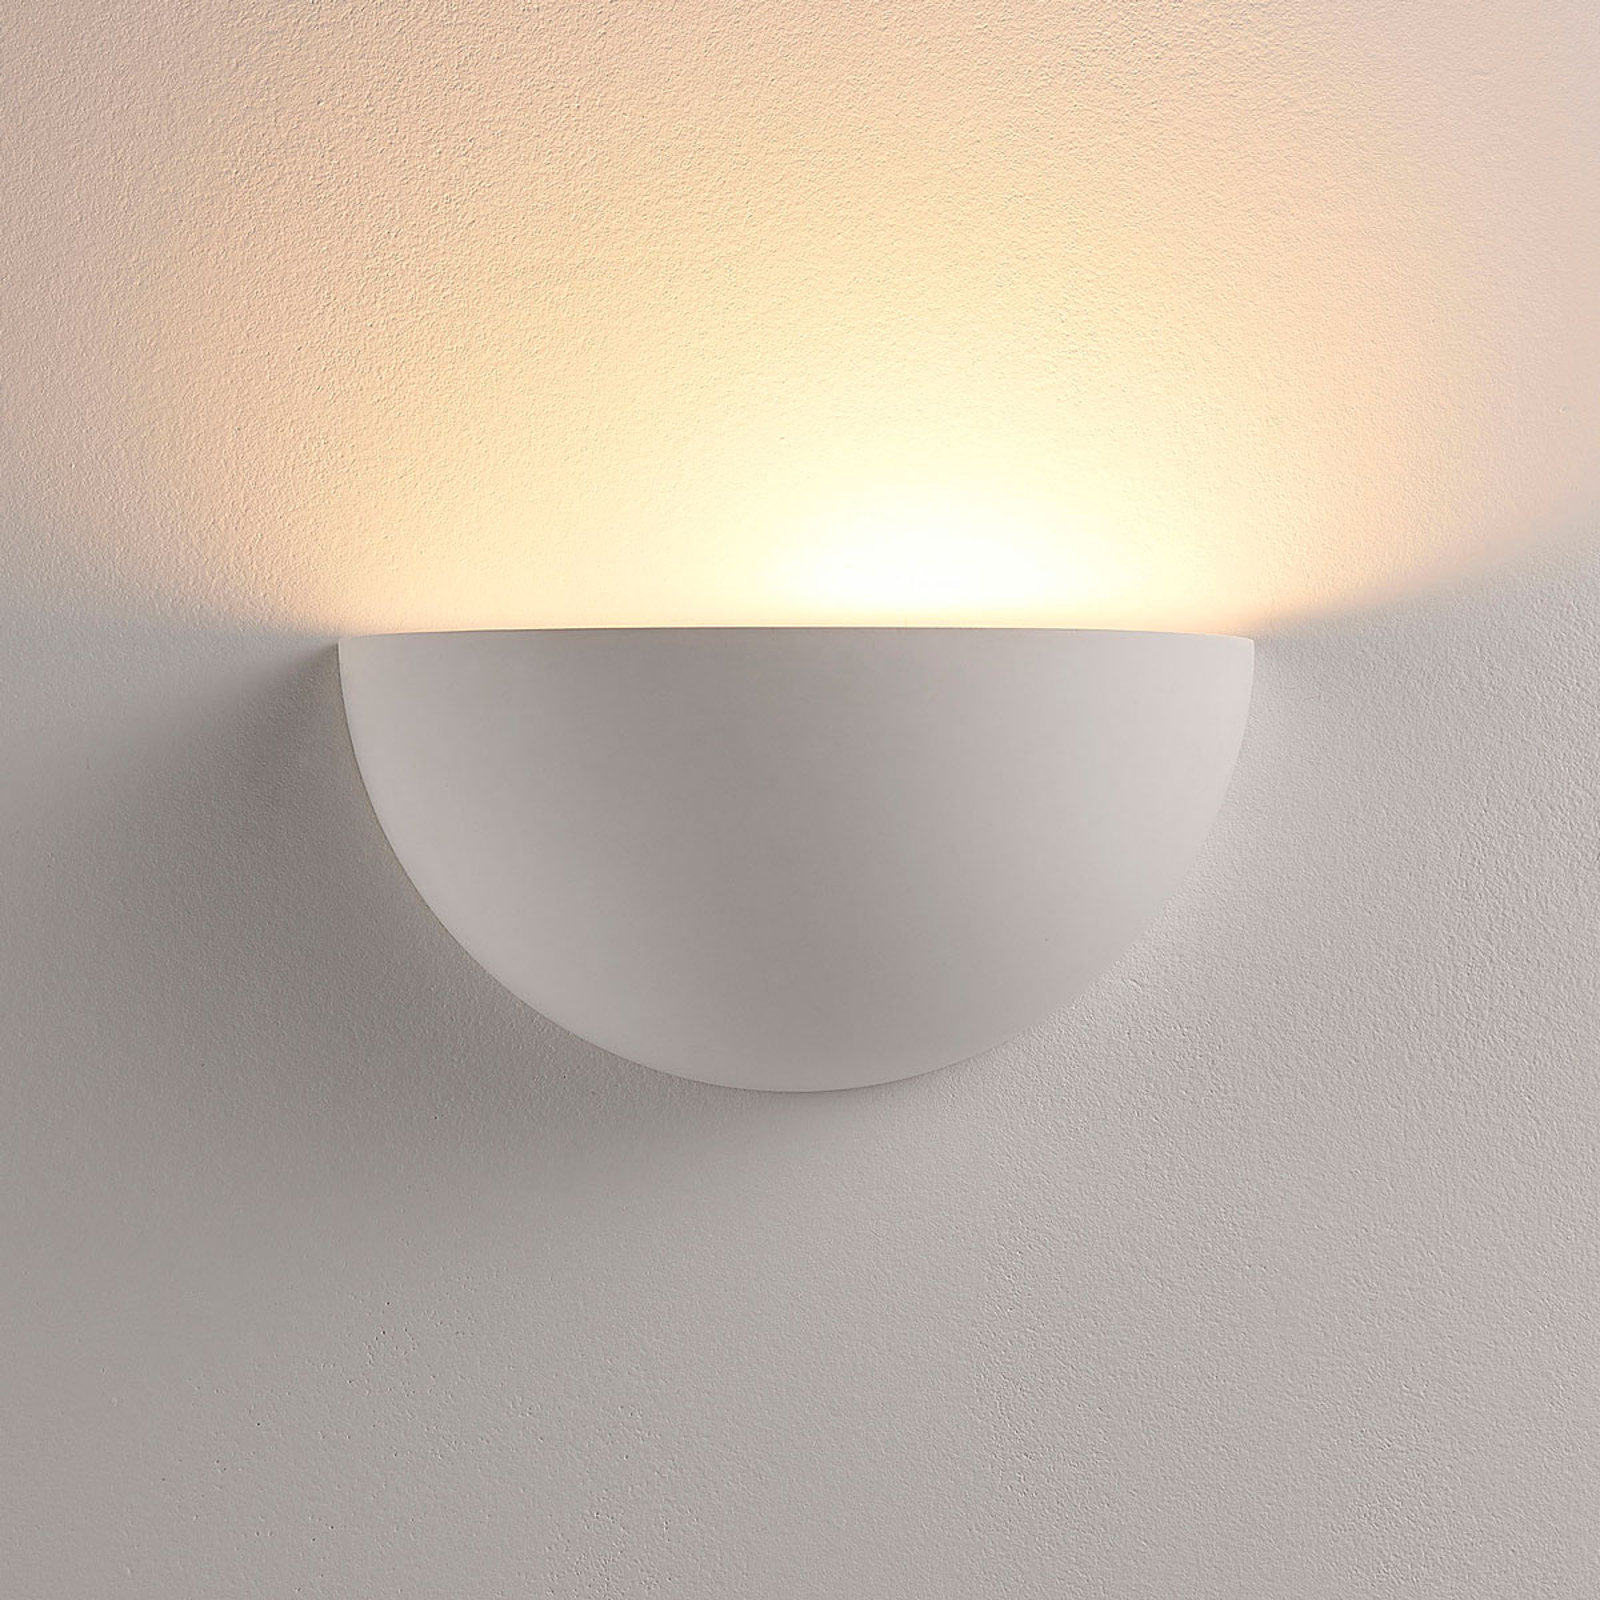 Halfronde LED uplight wandlamp Nahrin gips, wit